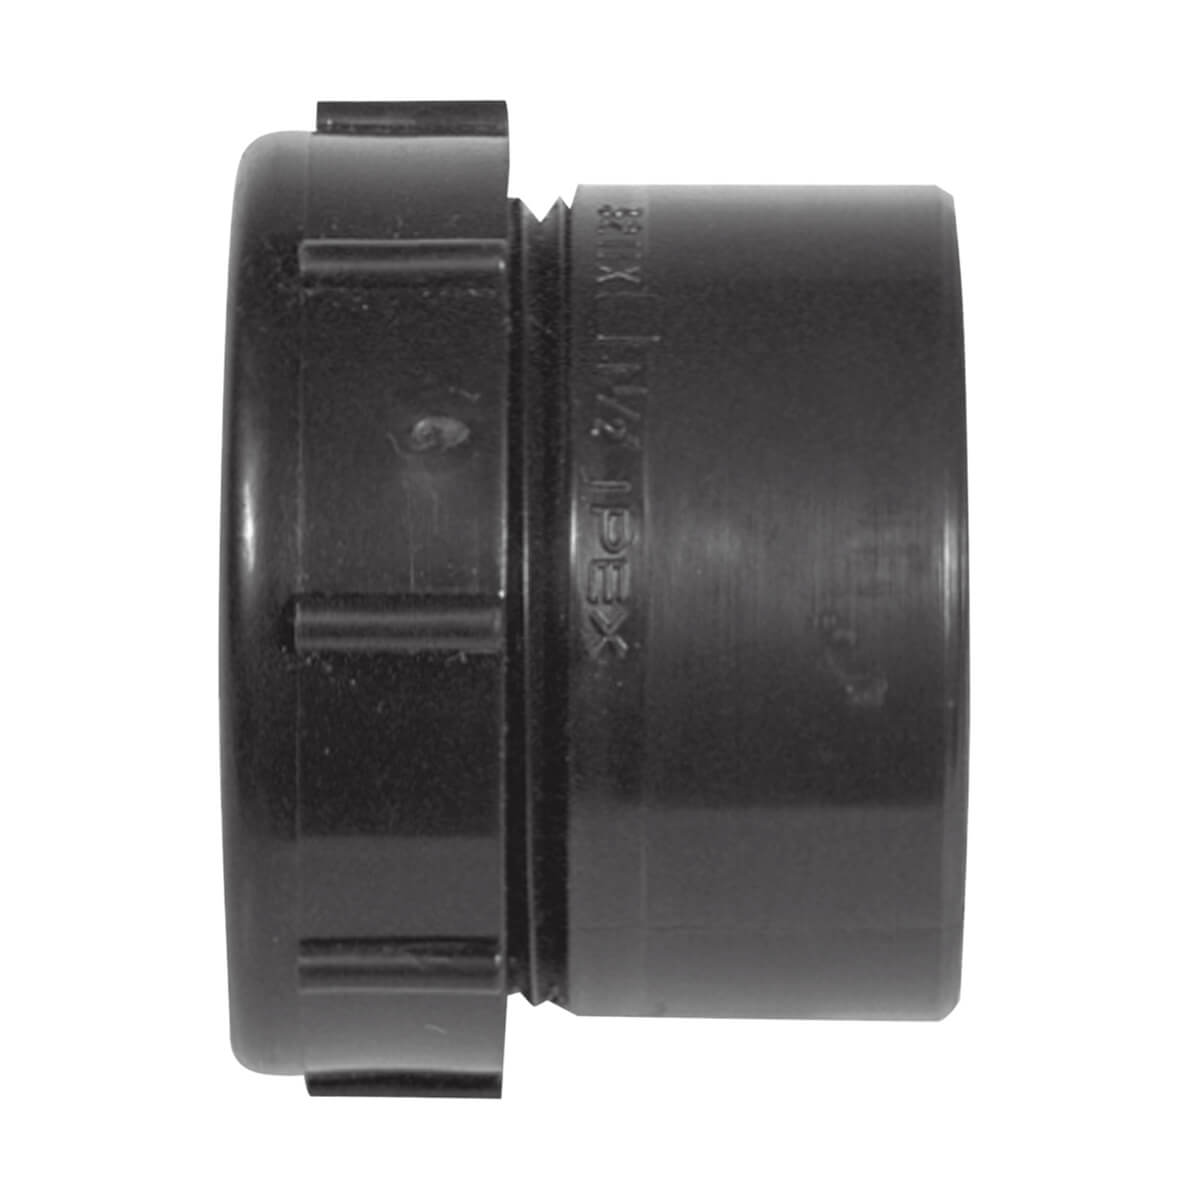 ABS-DWV Male Trap Adapter - Spigot x Plastic Nut - 1-1/2-in